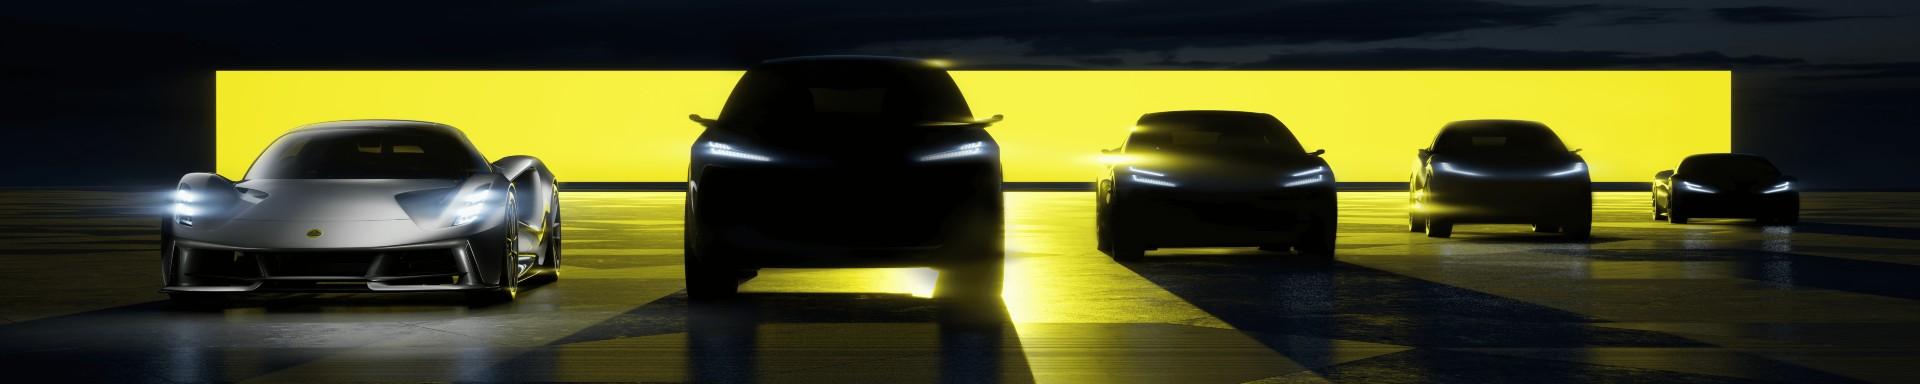 New Lotus E-Sports Platform Will Underpin Elise And Evora EV Successors